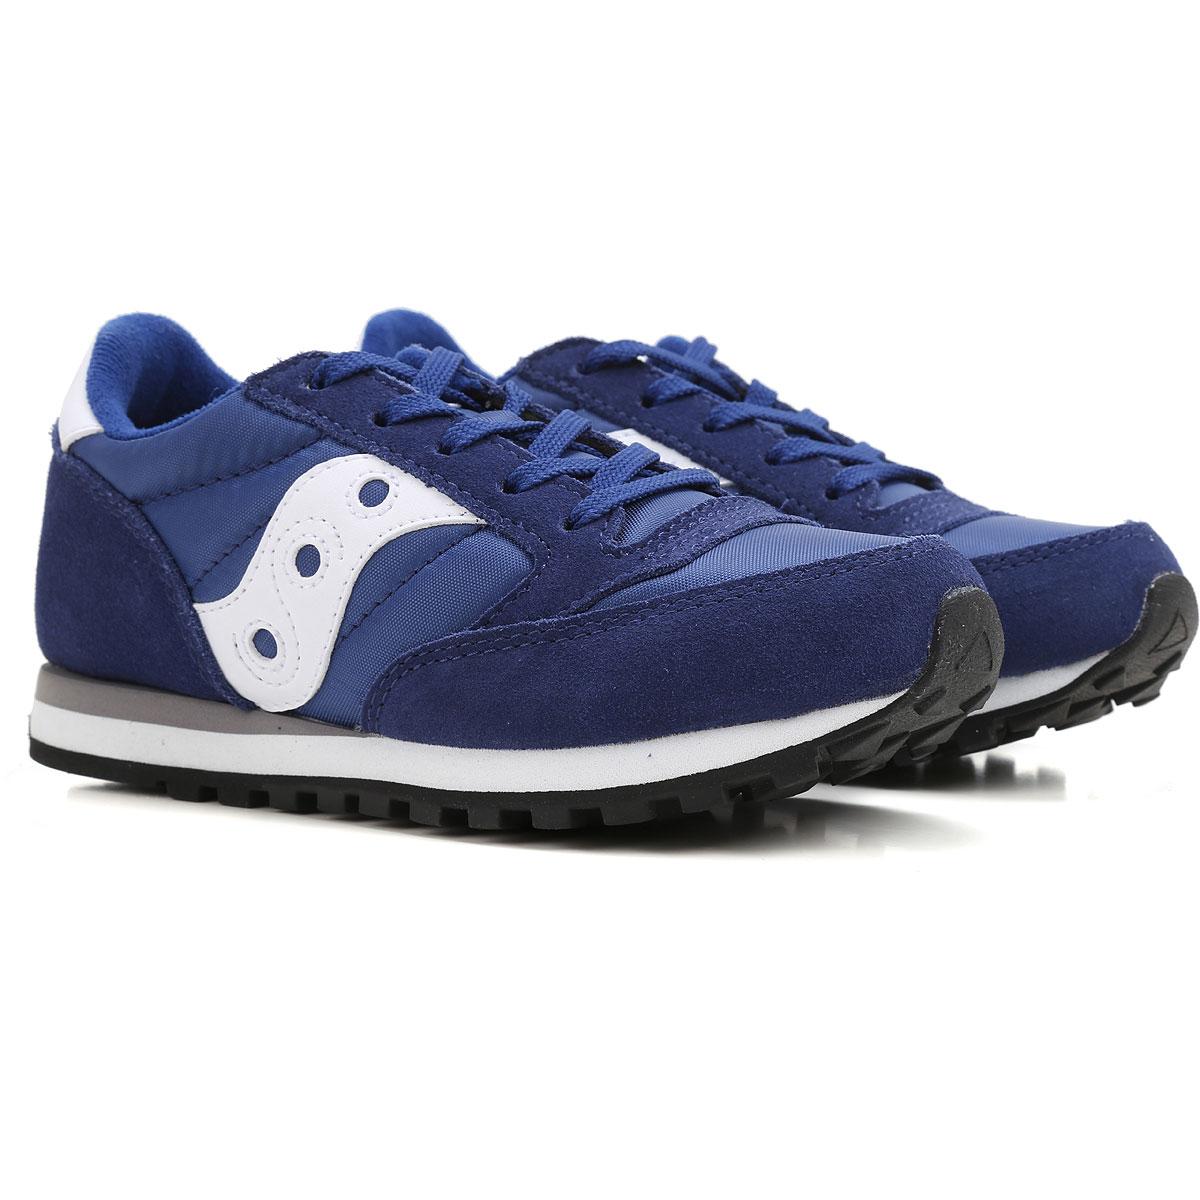 Saucony Zapatos para Niño Baratos en Rebajas Outlet, Bluette, Gamuza, 2019, 34